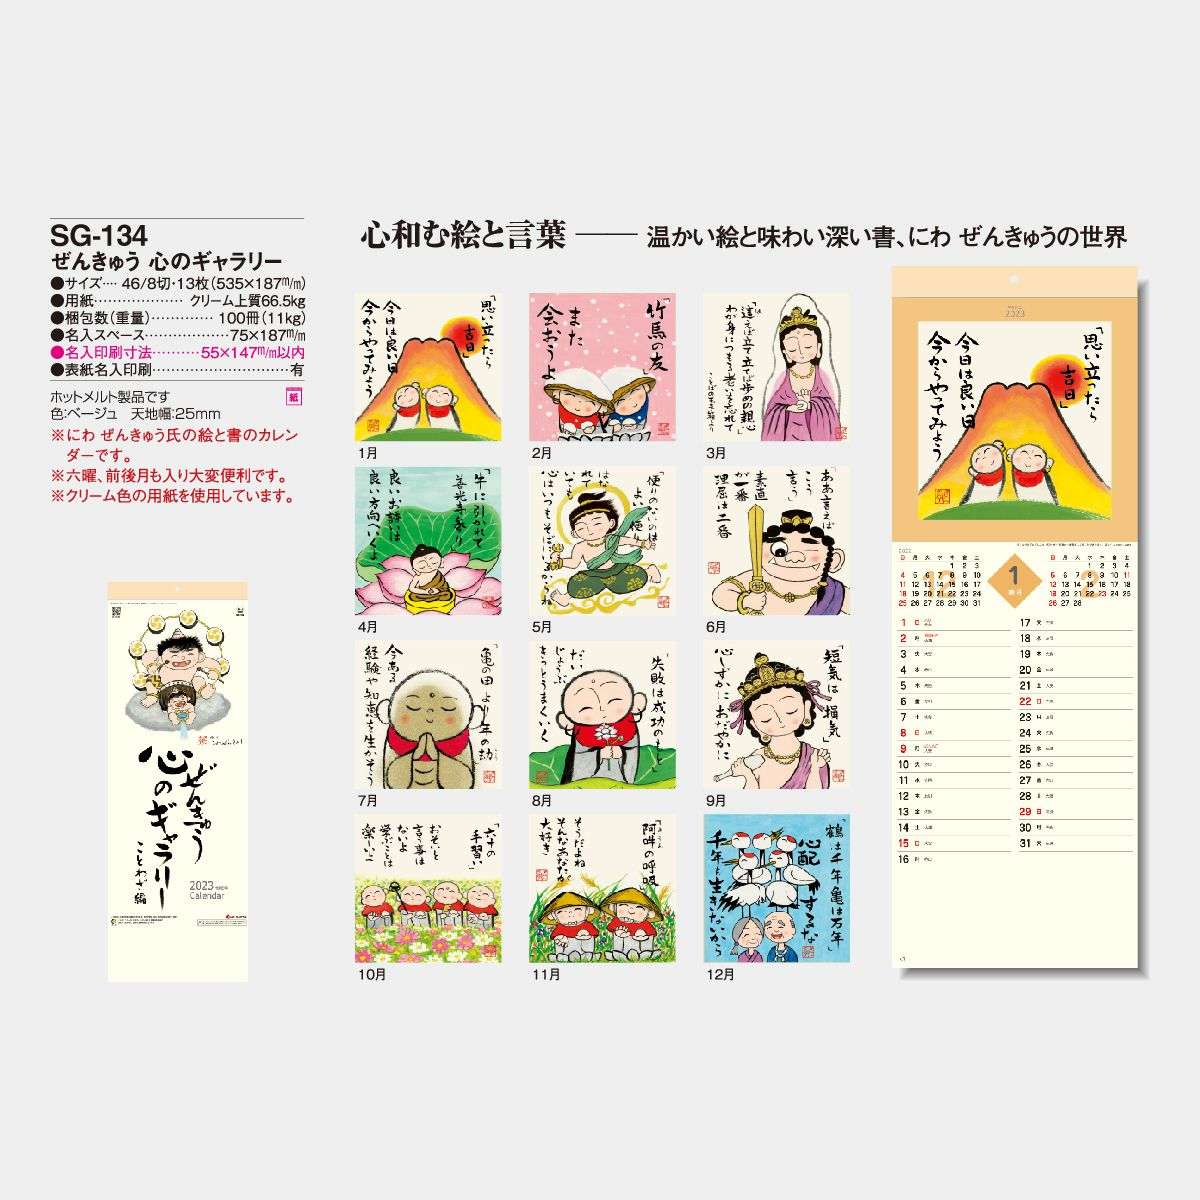 SG-134 ぜんきゅう・心のギャラリー 2021年版名入れカレンダーを格安で ...